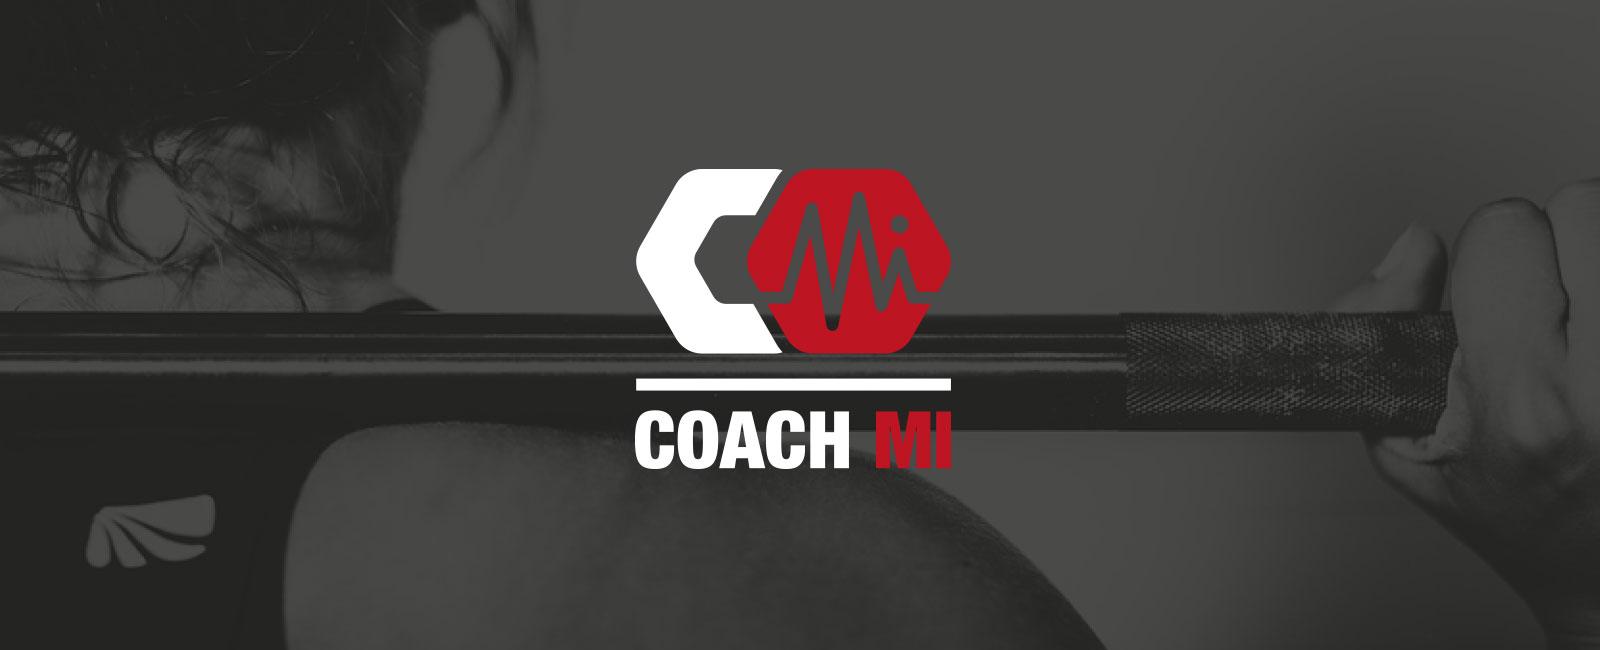 Coach Mi